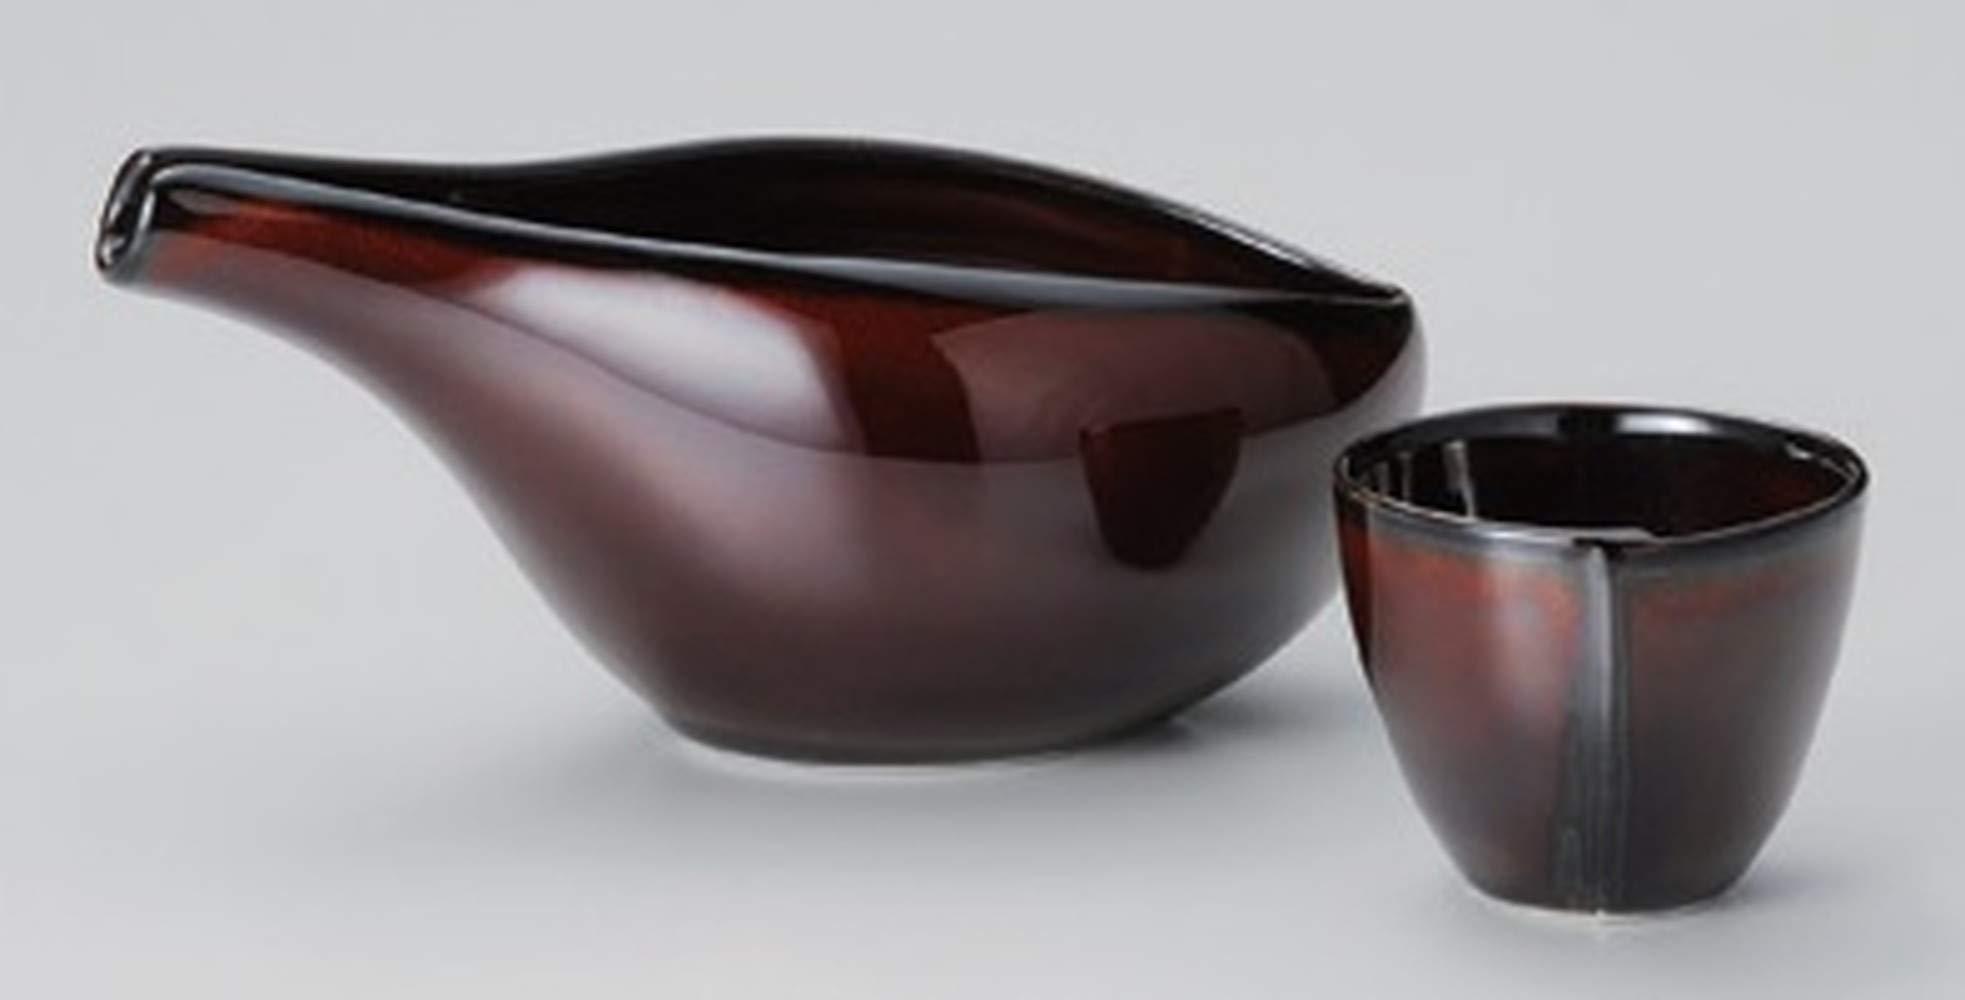 Ceramic Porcelain Sake Set Handcraft Traditional Pottery Made in Japan 1PC Sake Bottle and 1PC Sake Cup